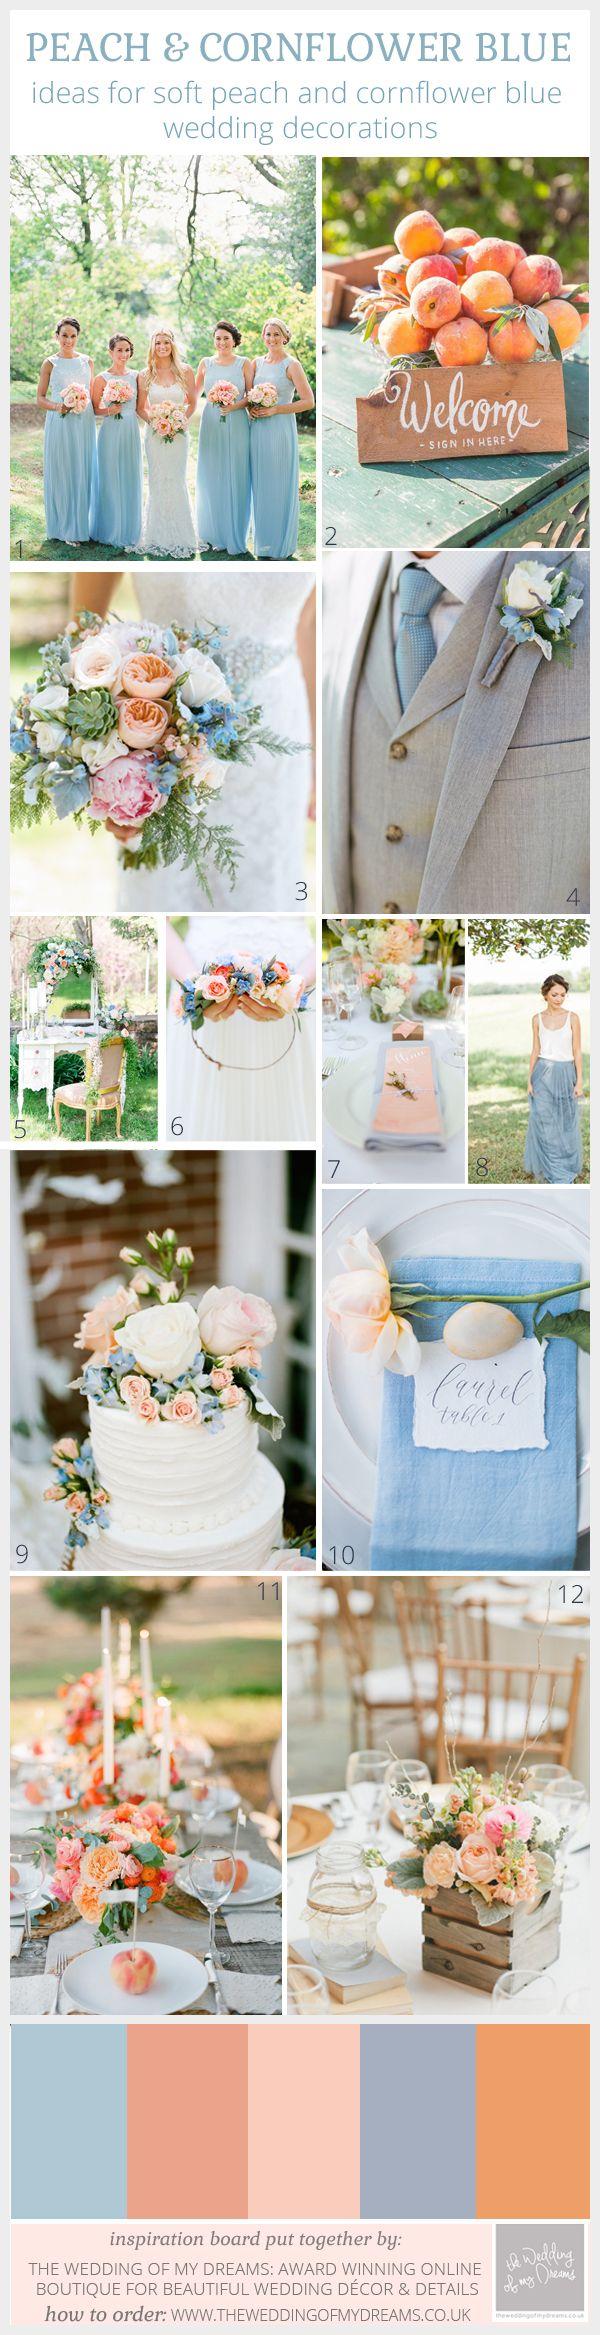 Blue wedding decor ideas  An Olive Green and Grey Wedding Colour Scheme  Blue wedding